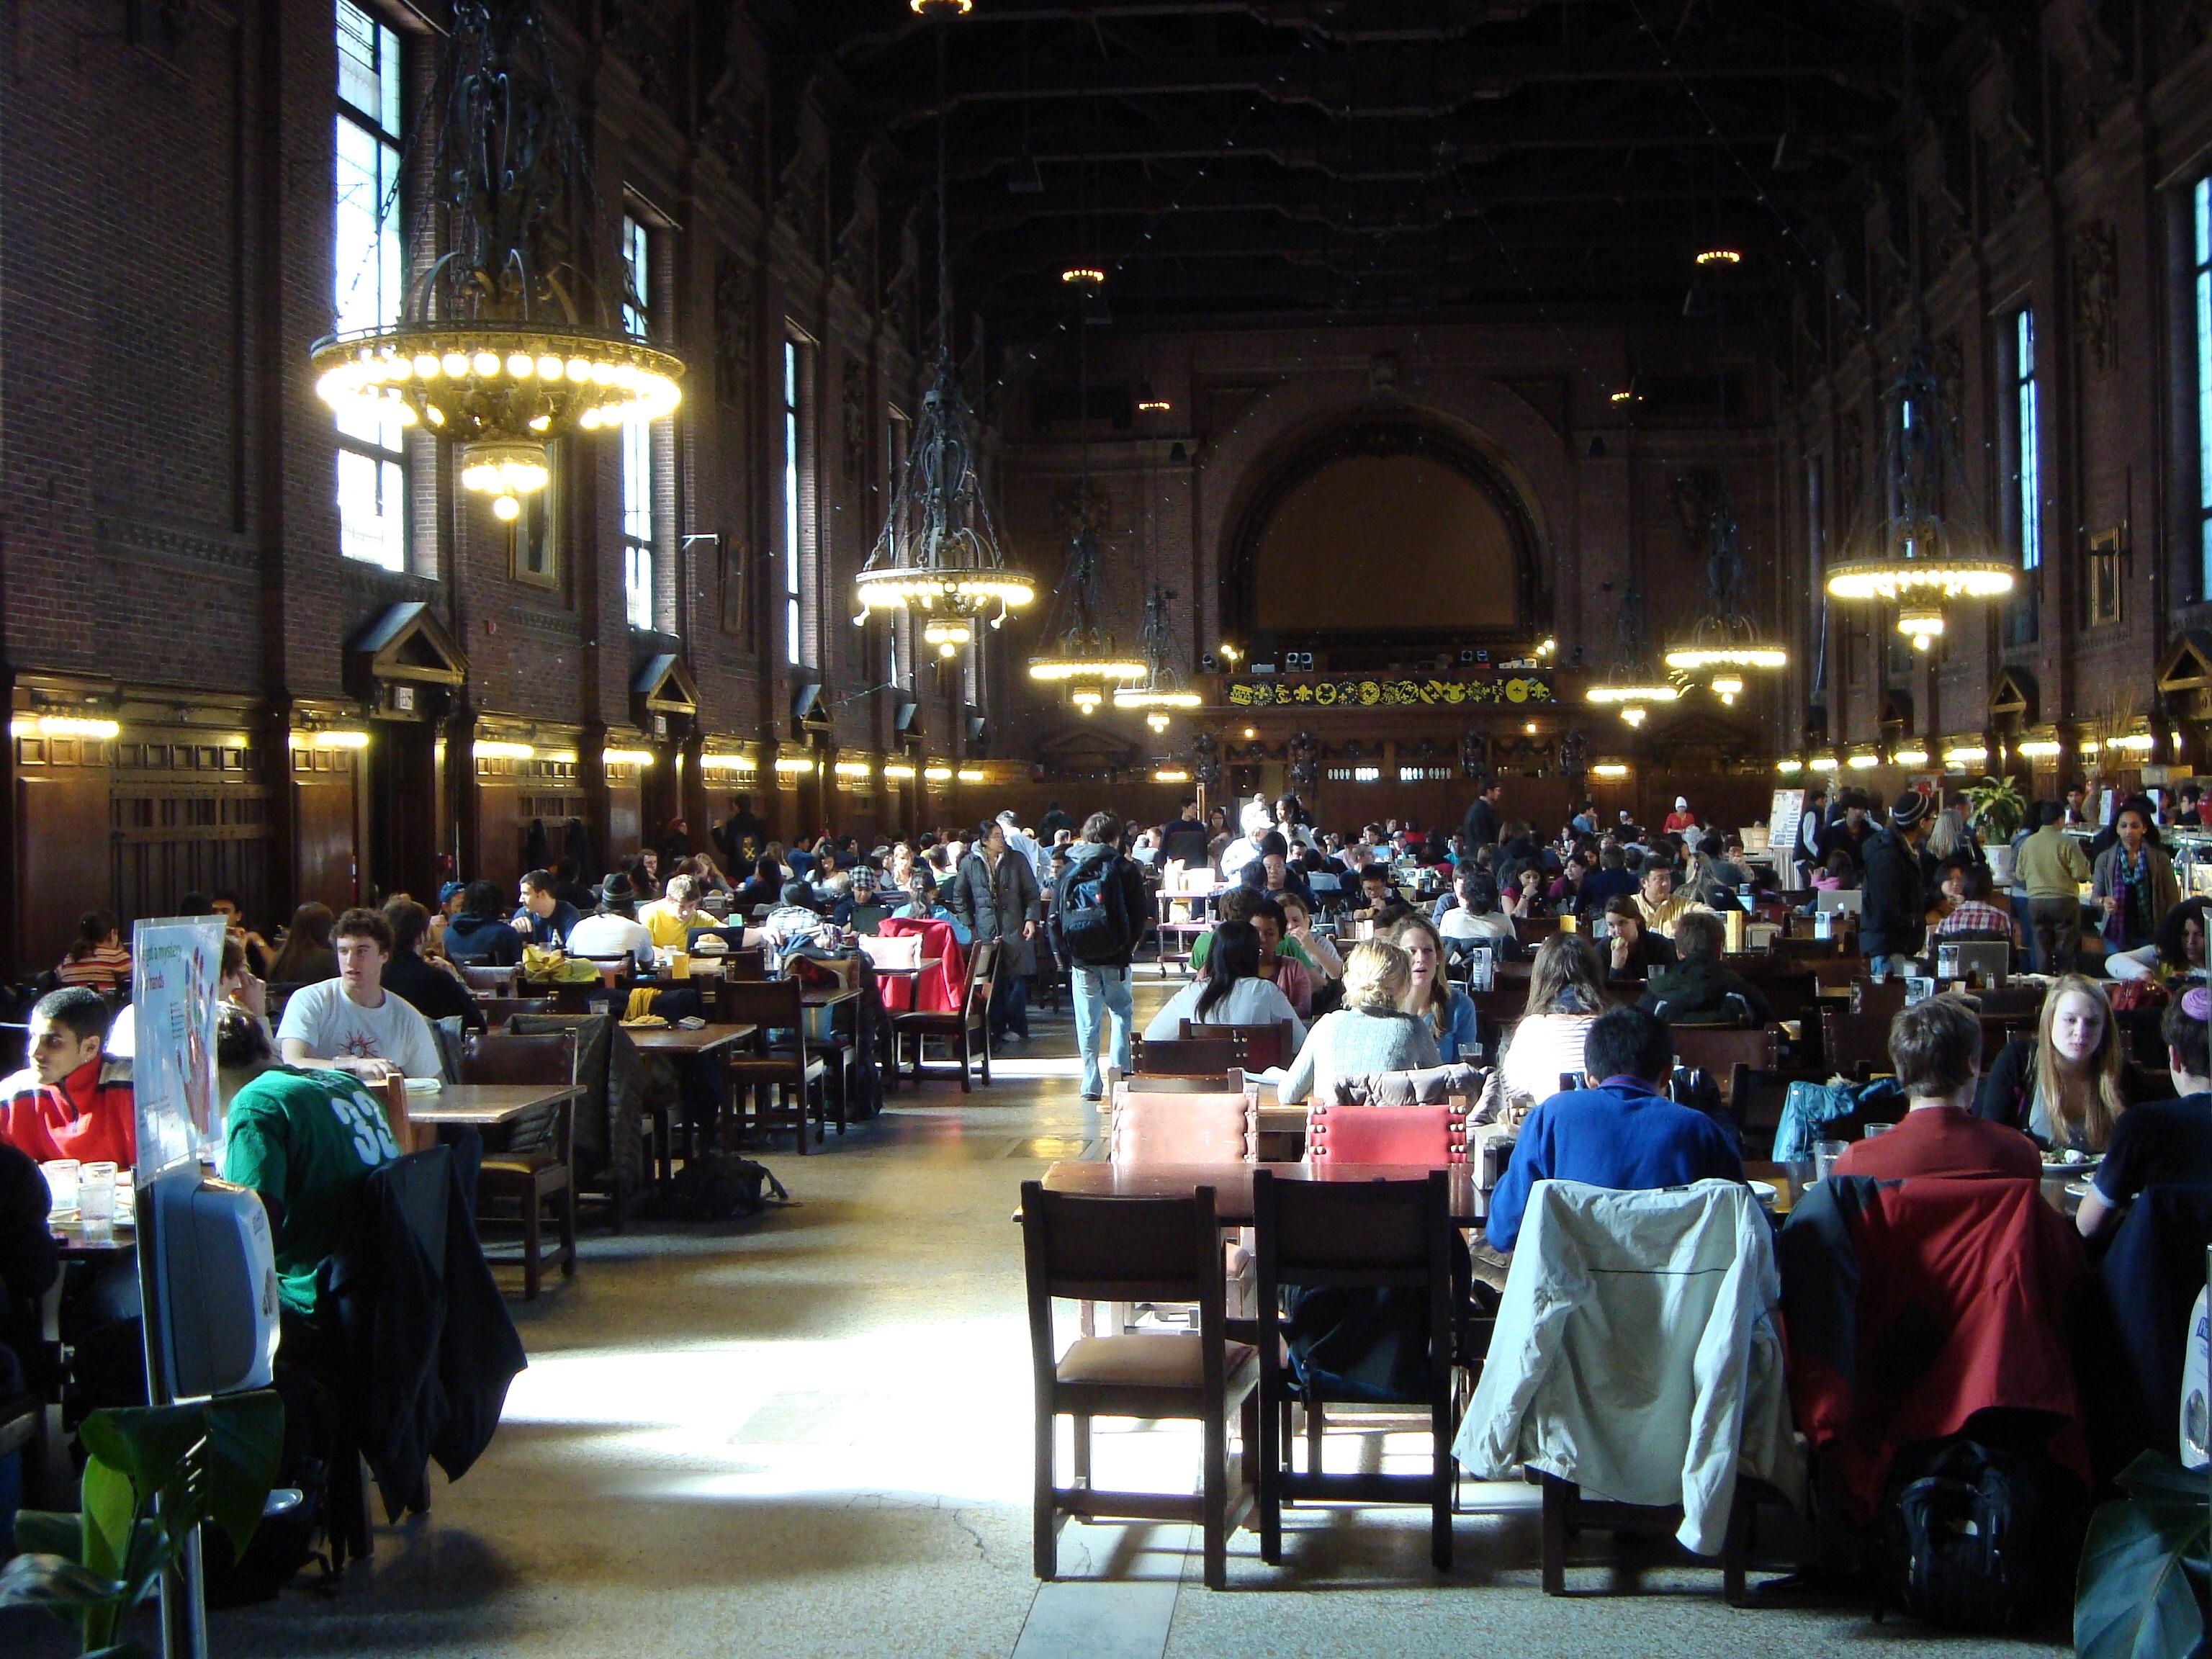 Fileyale University Undergraduate Commons Dining Hall New Haven